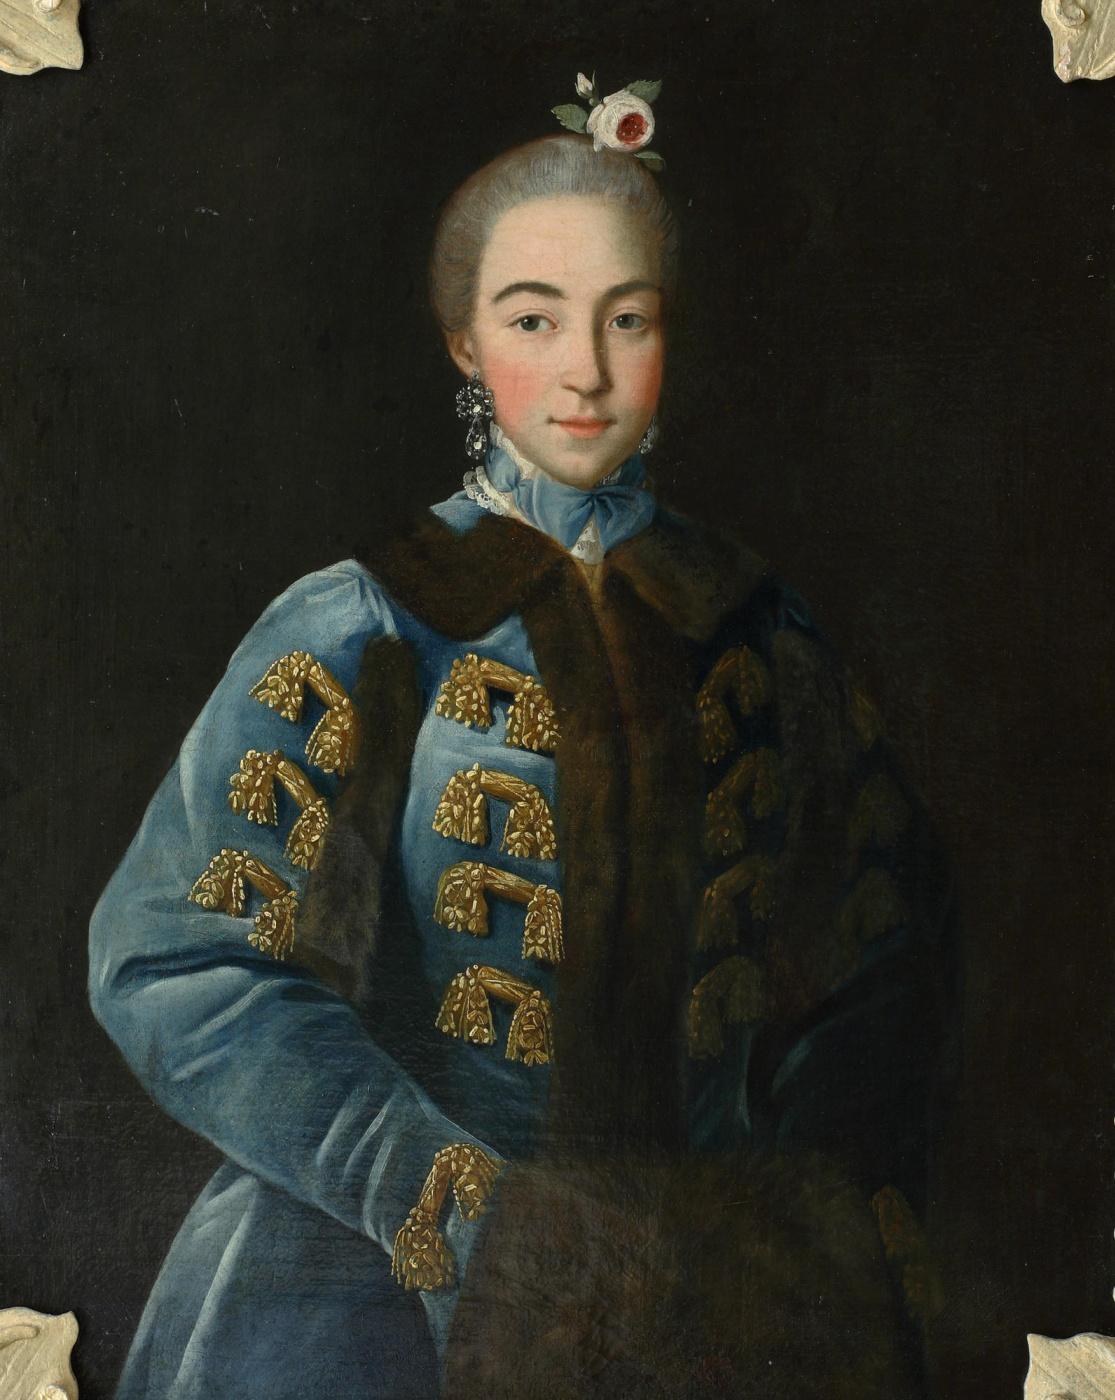 Ivan Petrovich Argunov. Portrait of A.P. Sheremeteva, the eldest daughter of P. B. Sheremetev